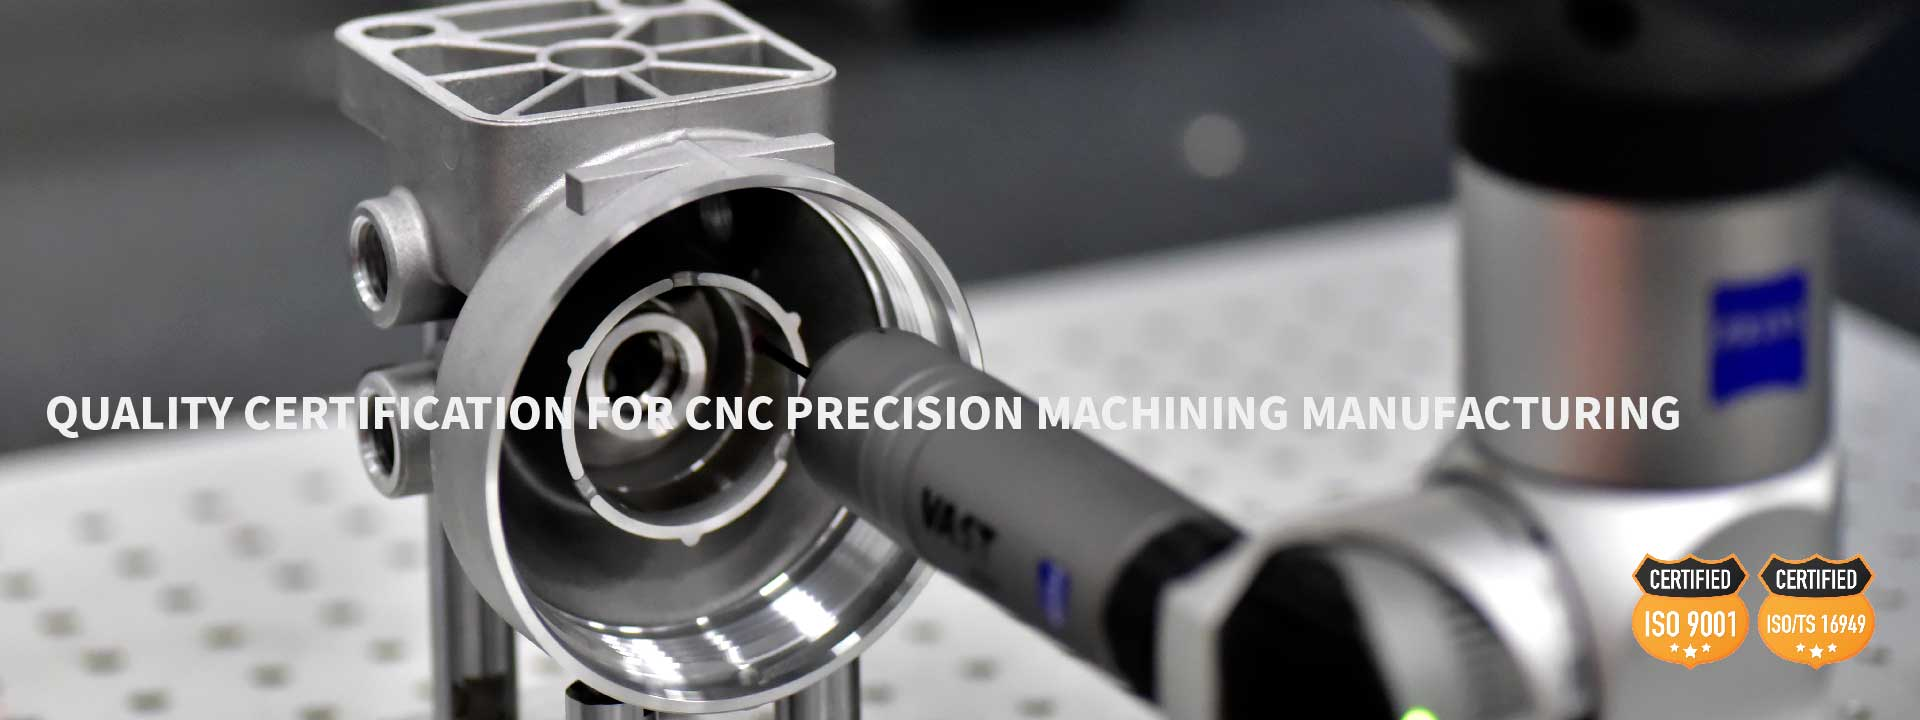 CNC-Precision-Machining-banner